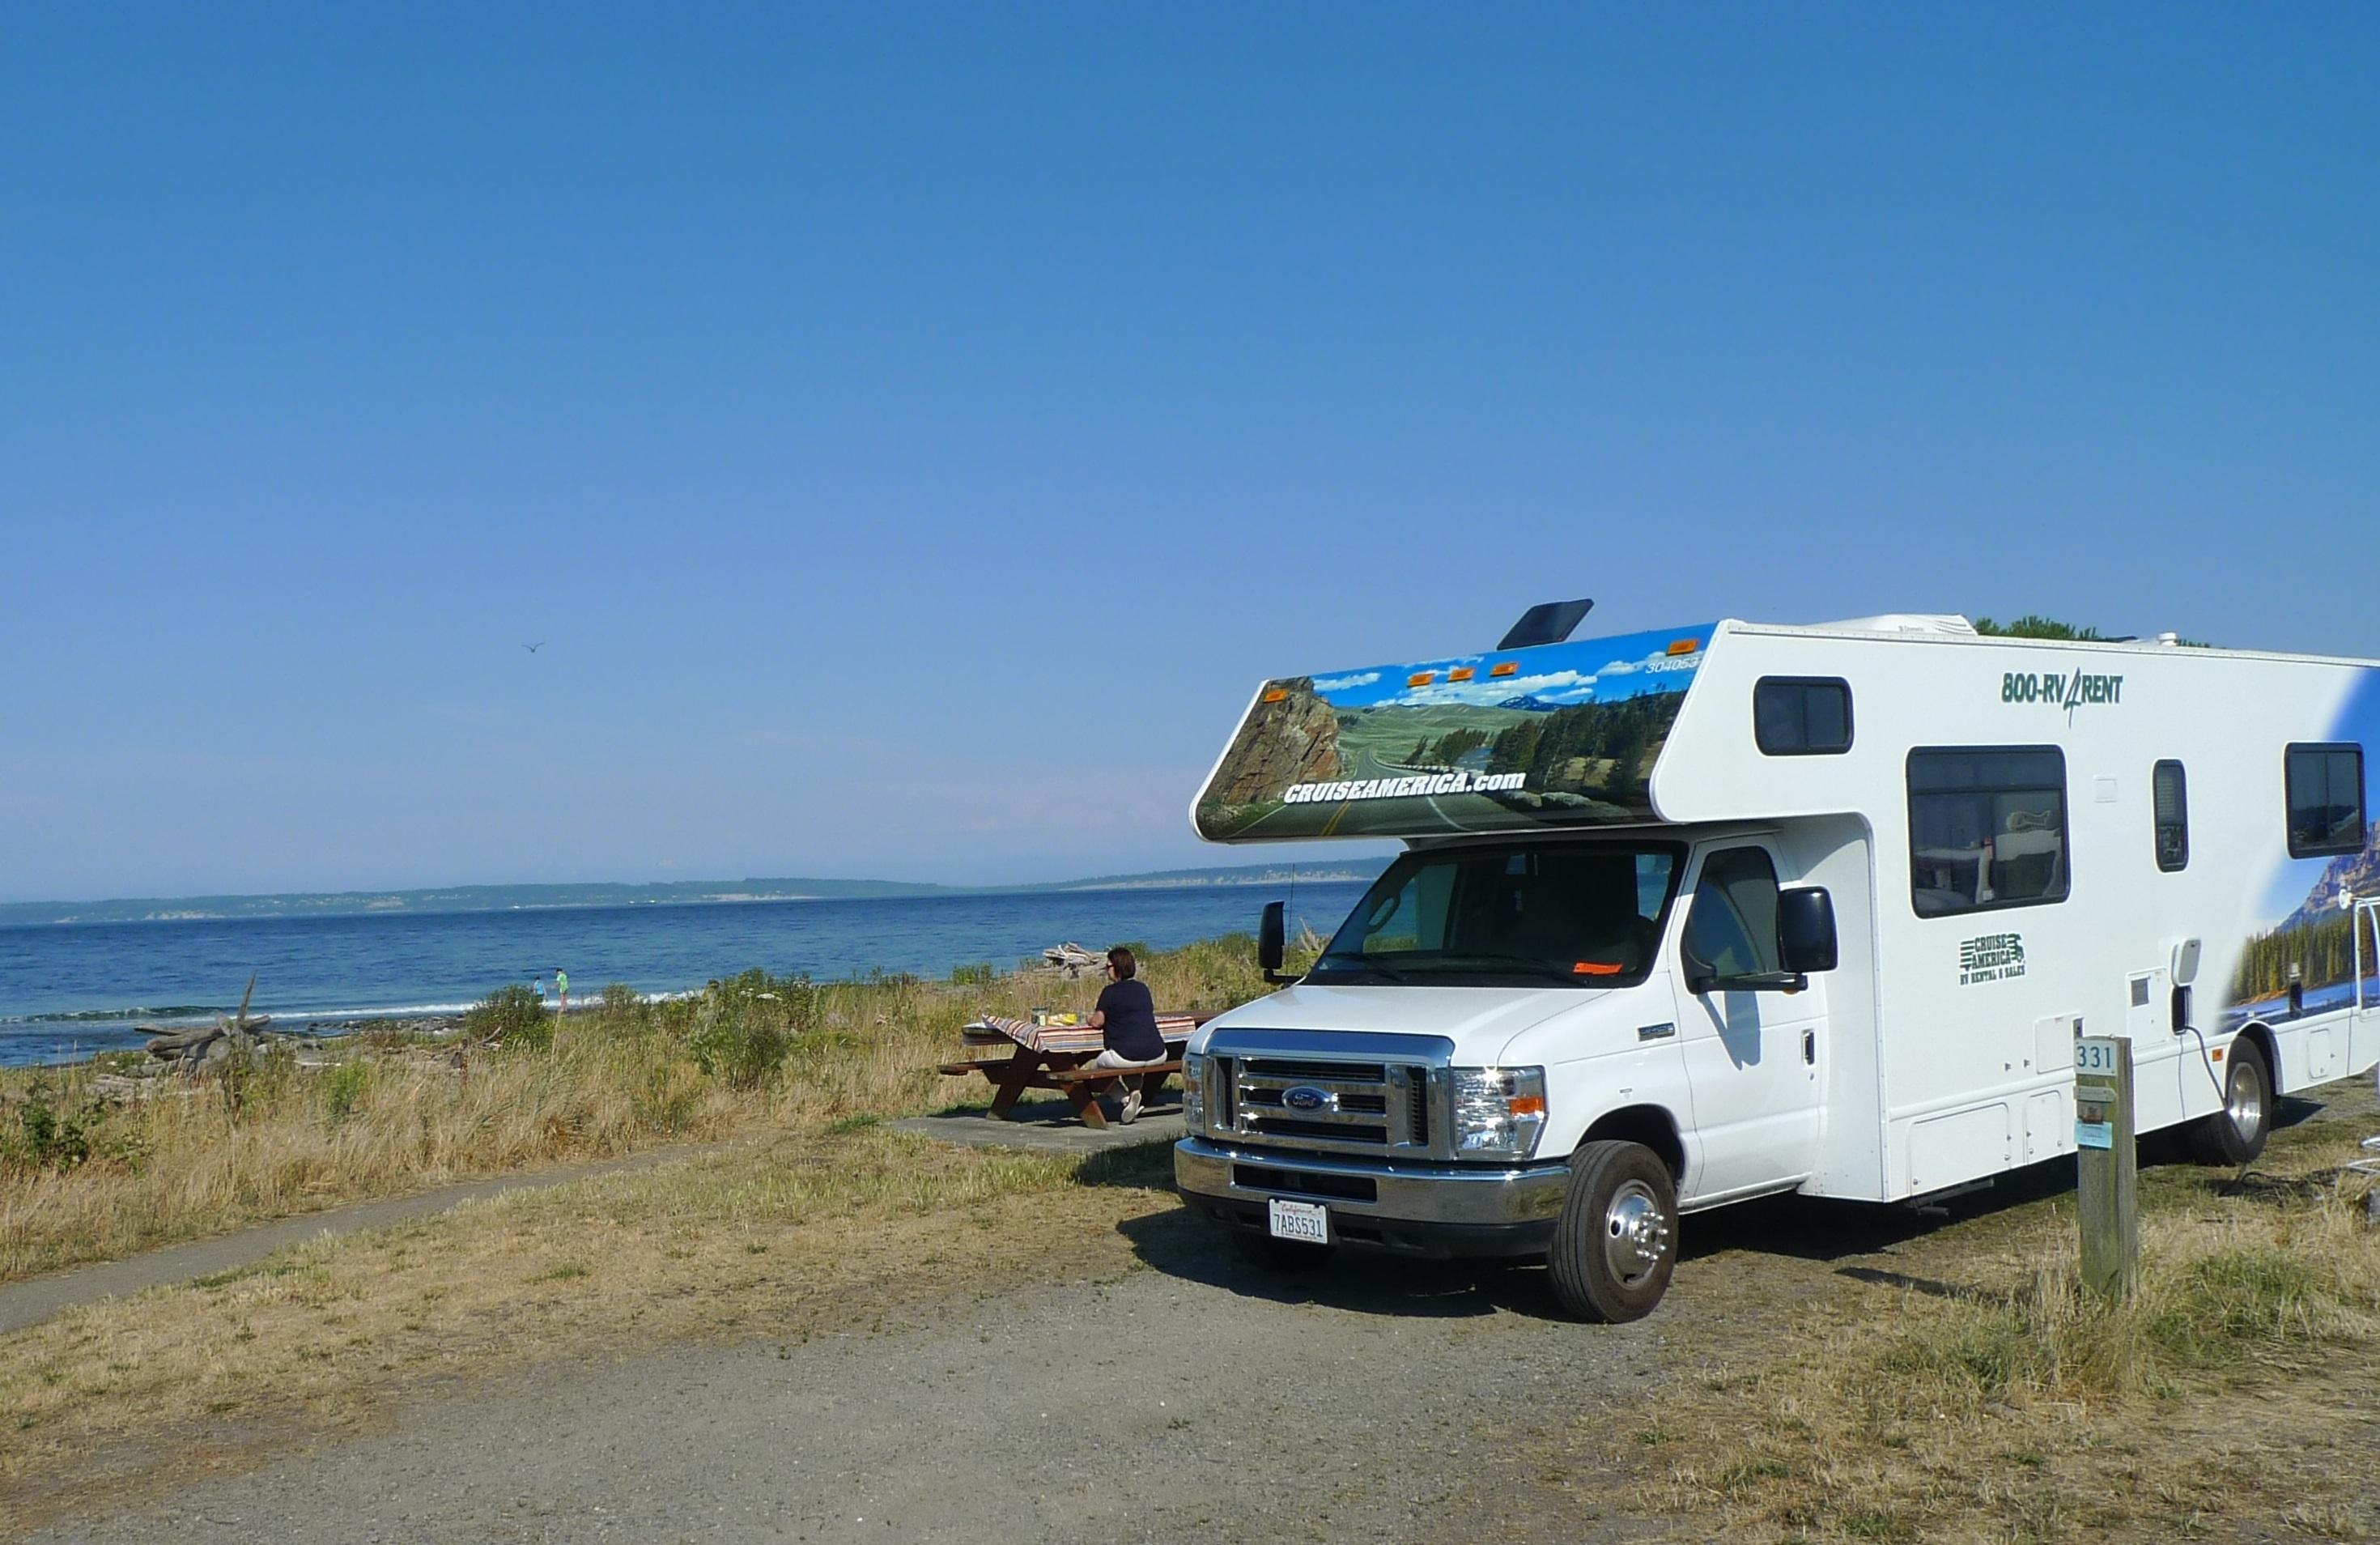 Martelle Cruise camper